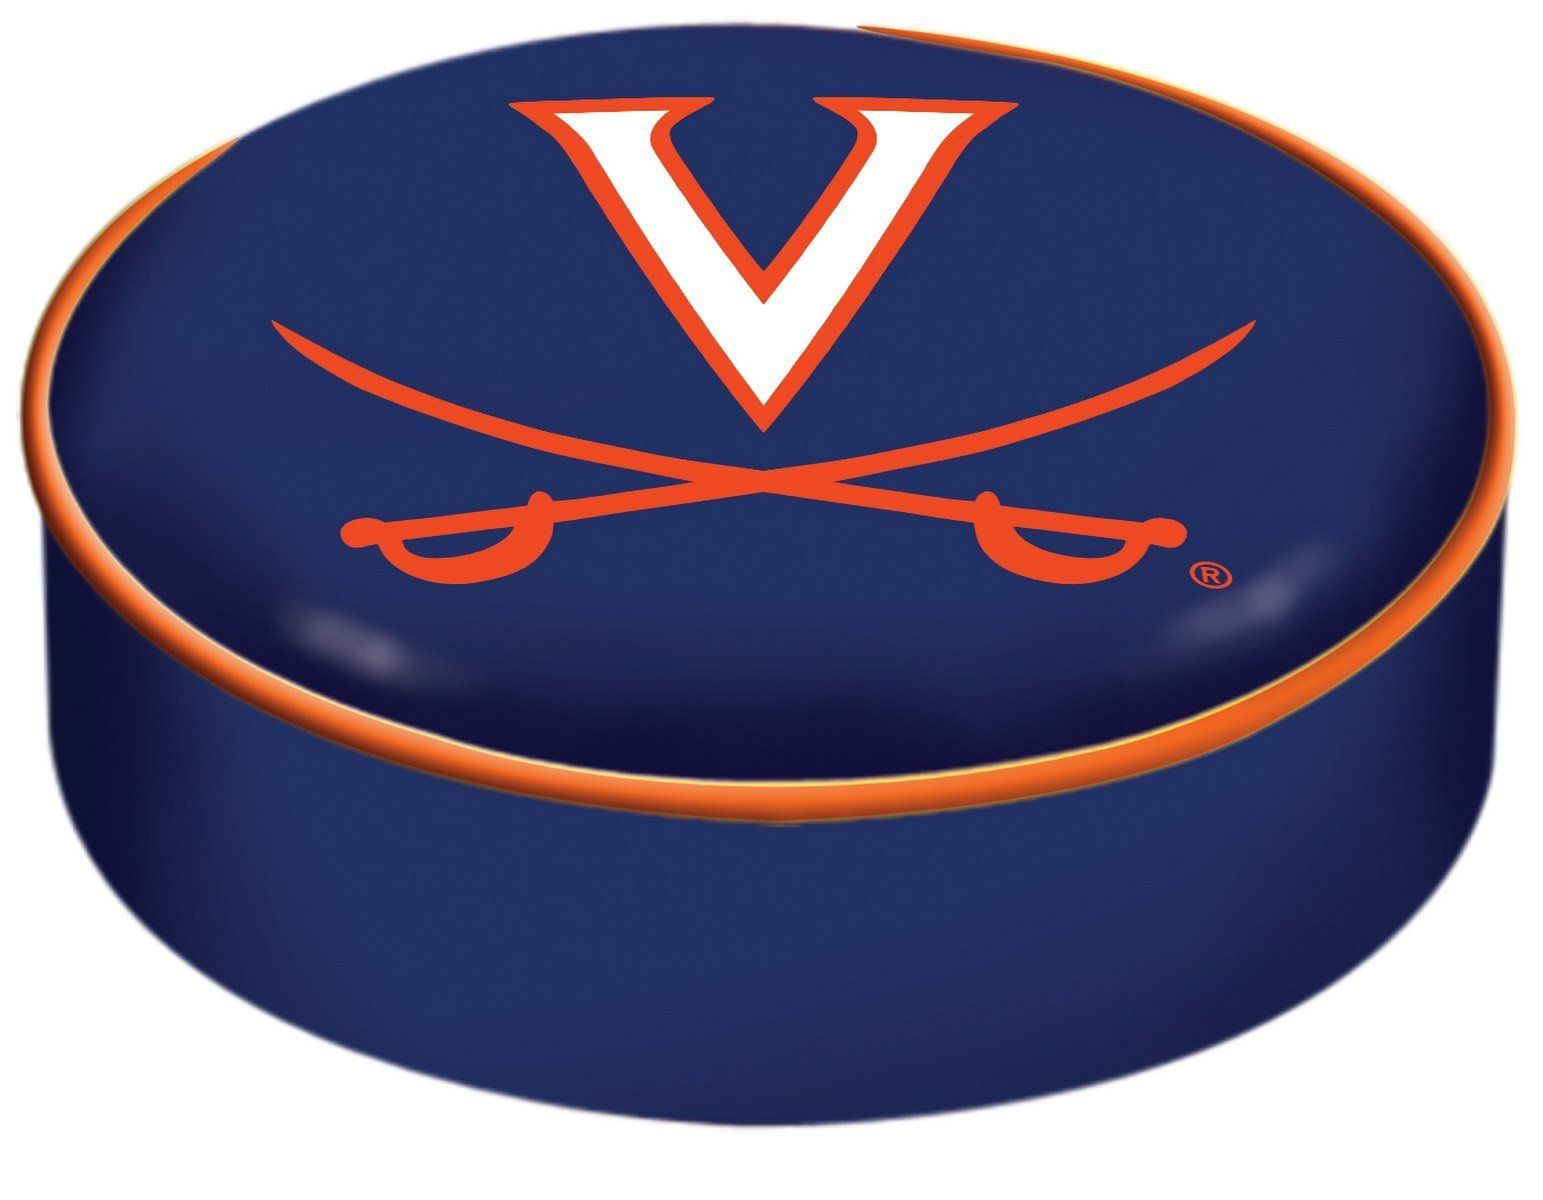 Astounding Virginia Cavaliers Hbs Navy Vinyl Elastic Slip Over Bar Andrewgaddart Wooden Chair Designs For Living Room Andrewgaddartcom